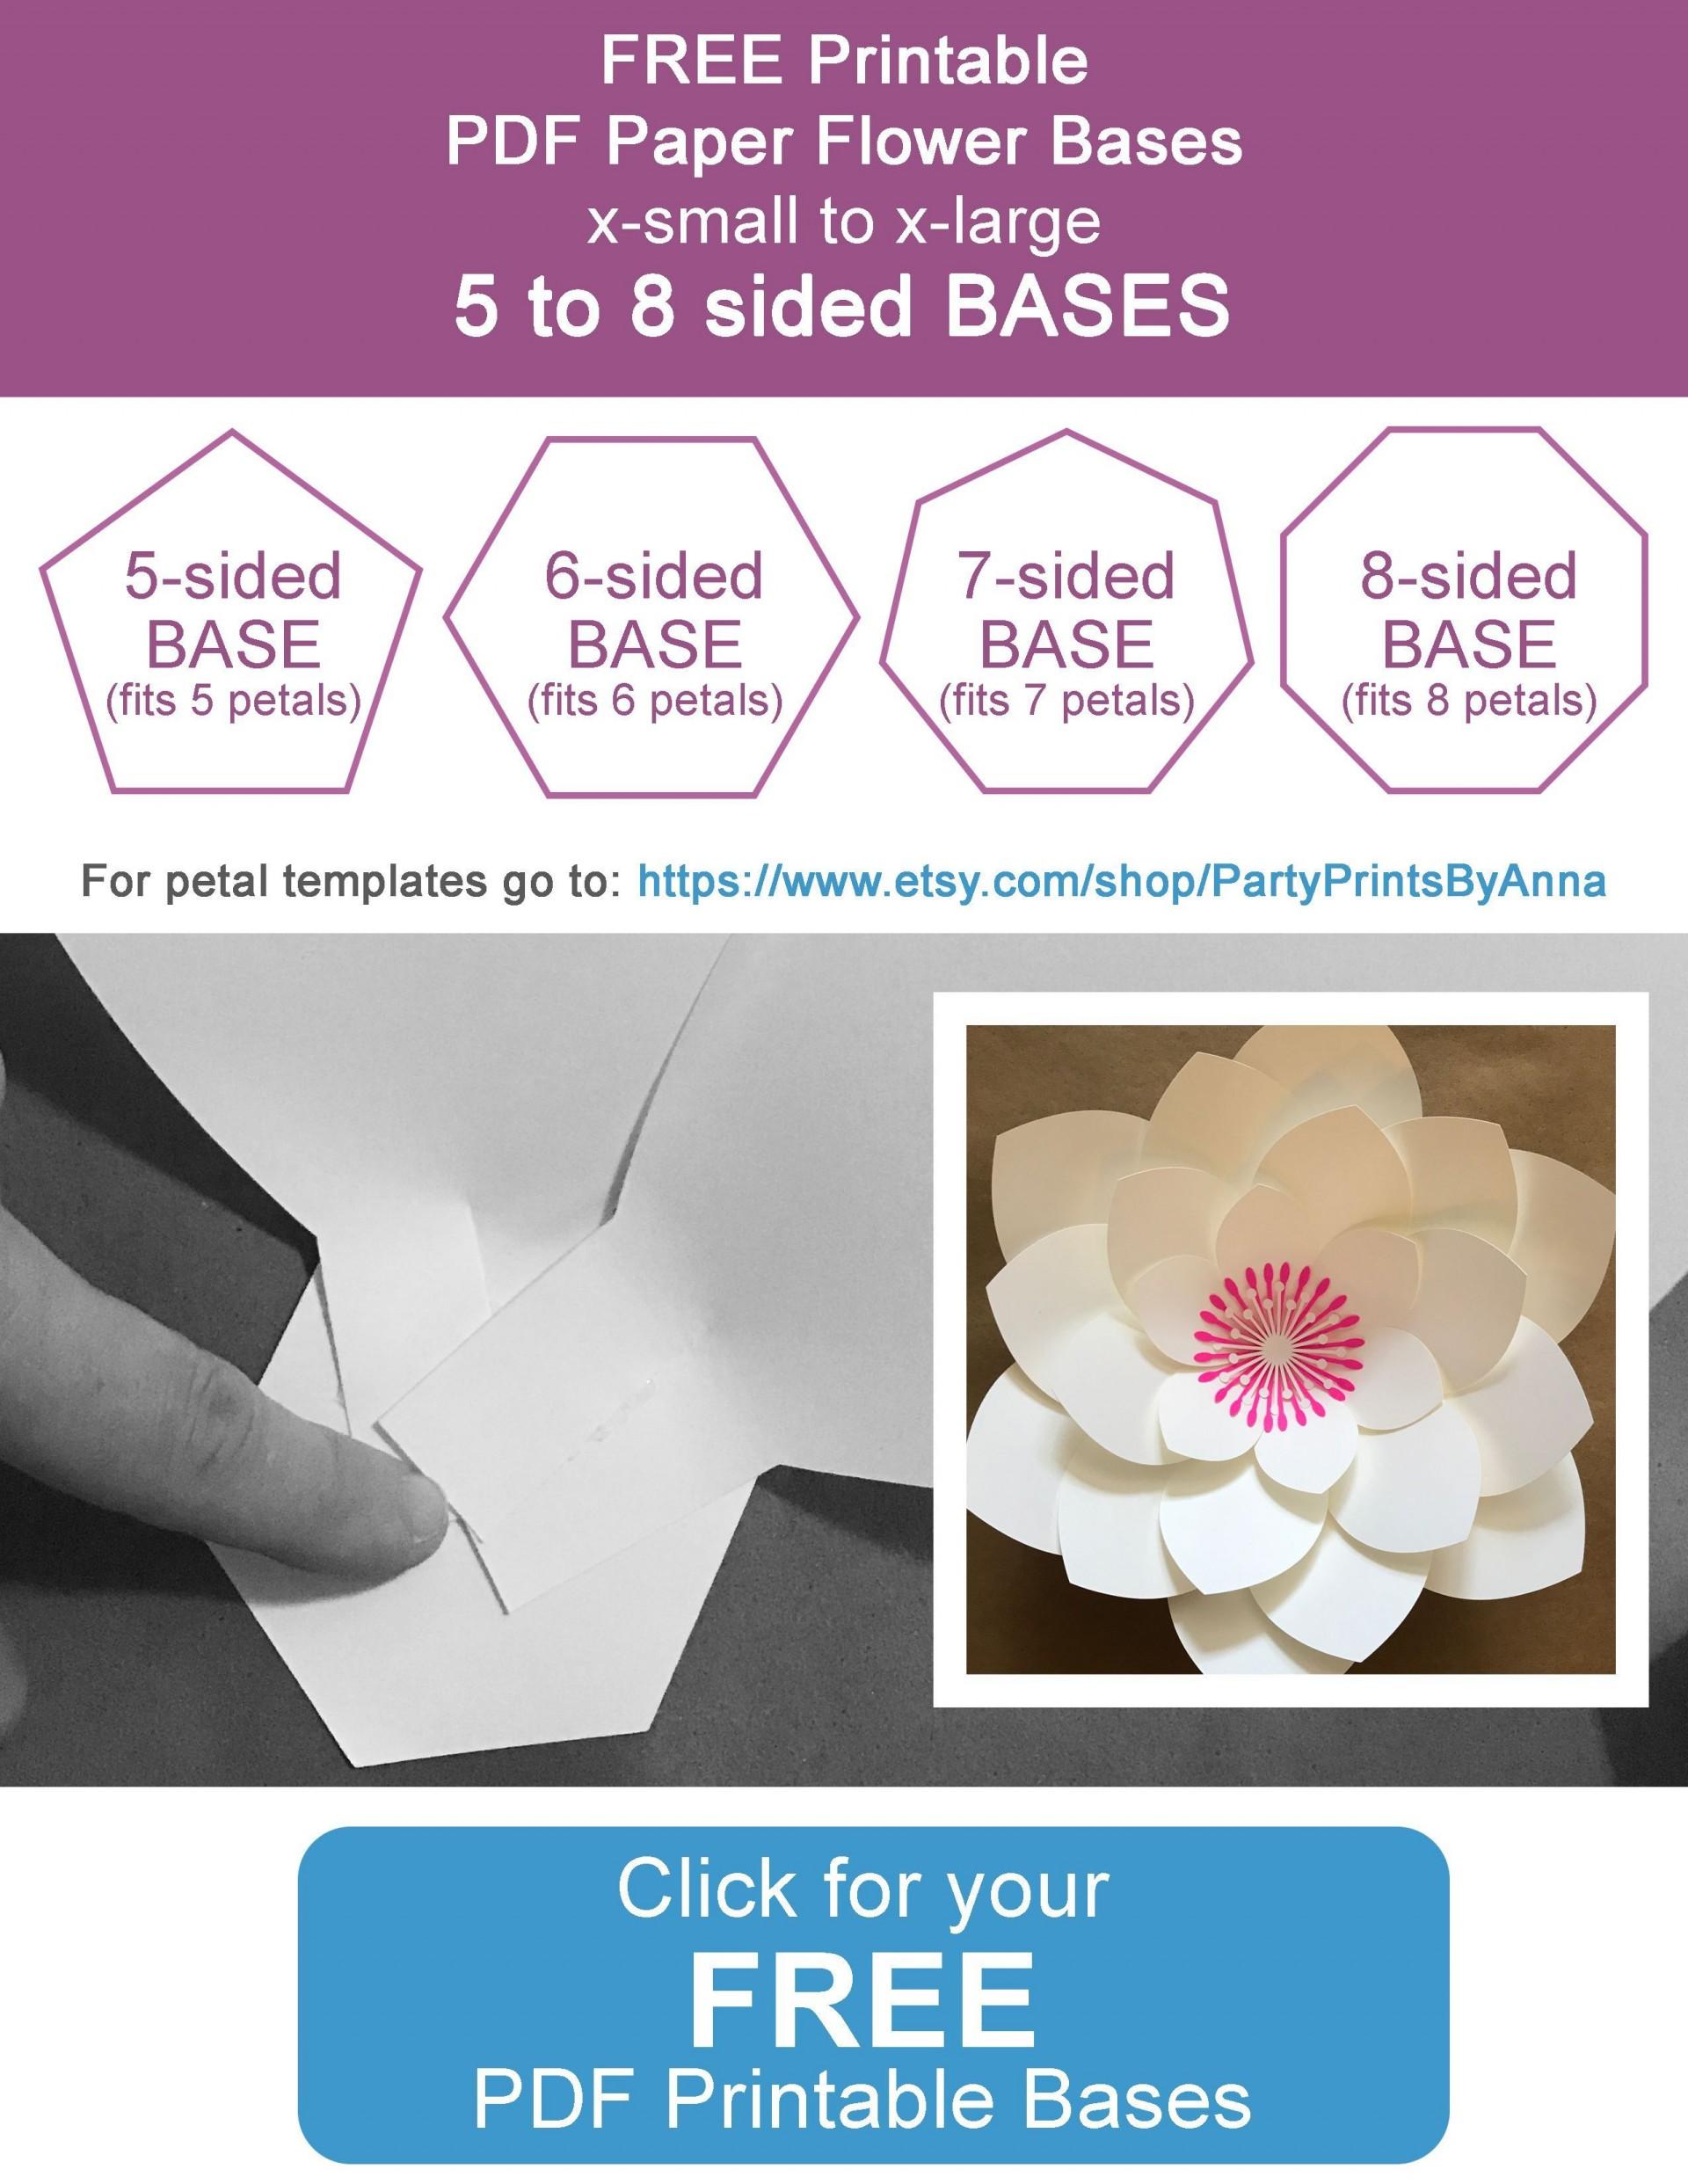 004 Striking Free Printable Diy Paper Flower Template Image  Templates1920